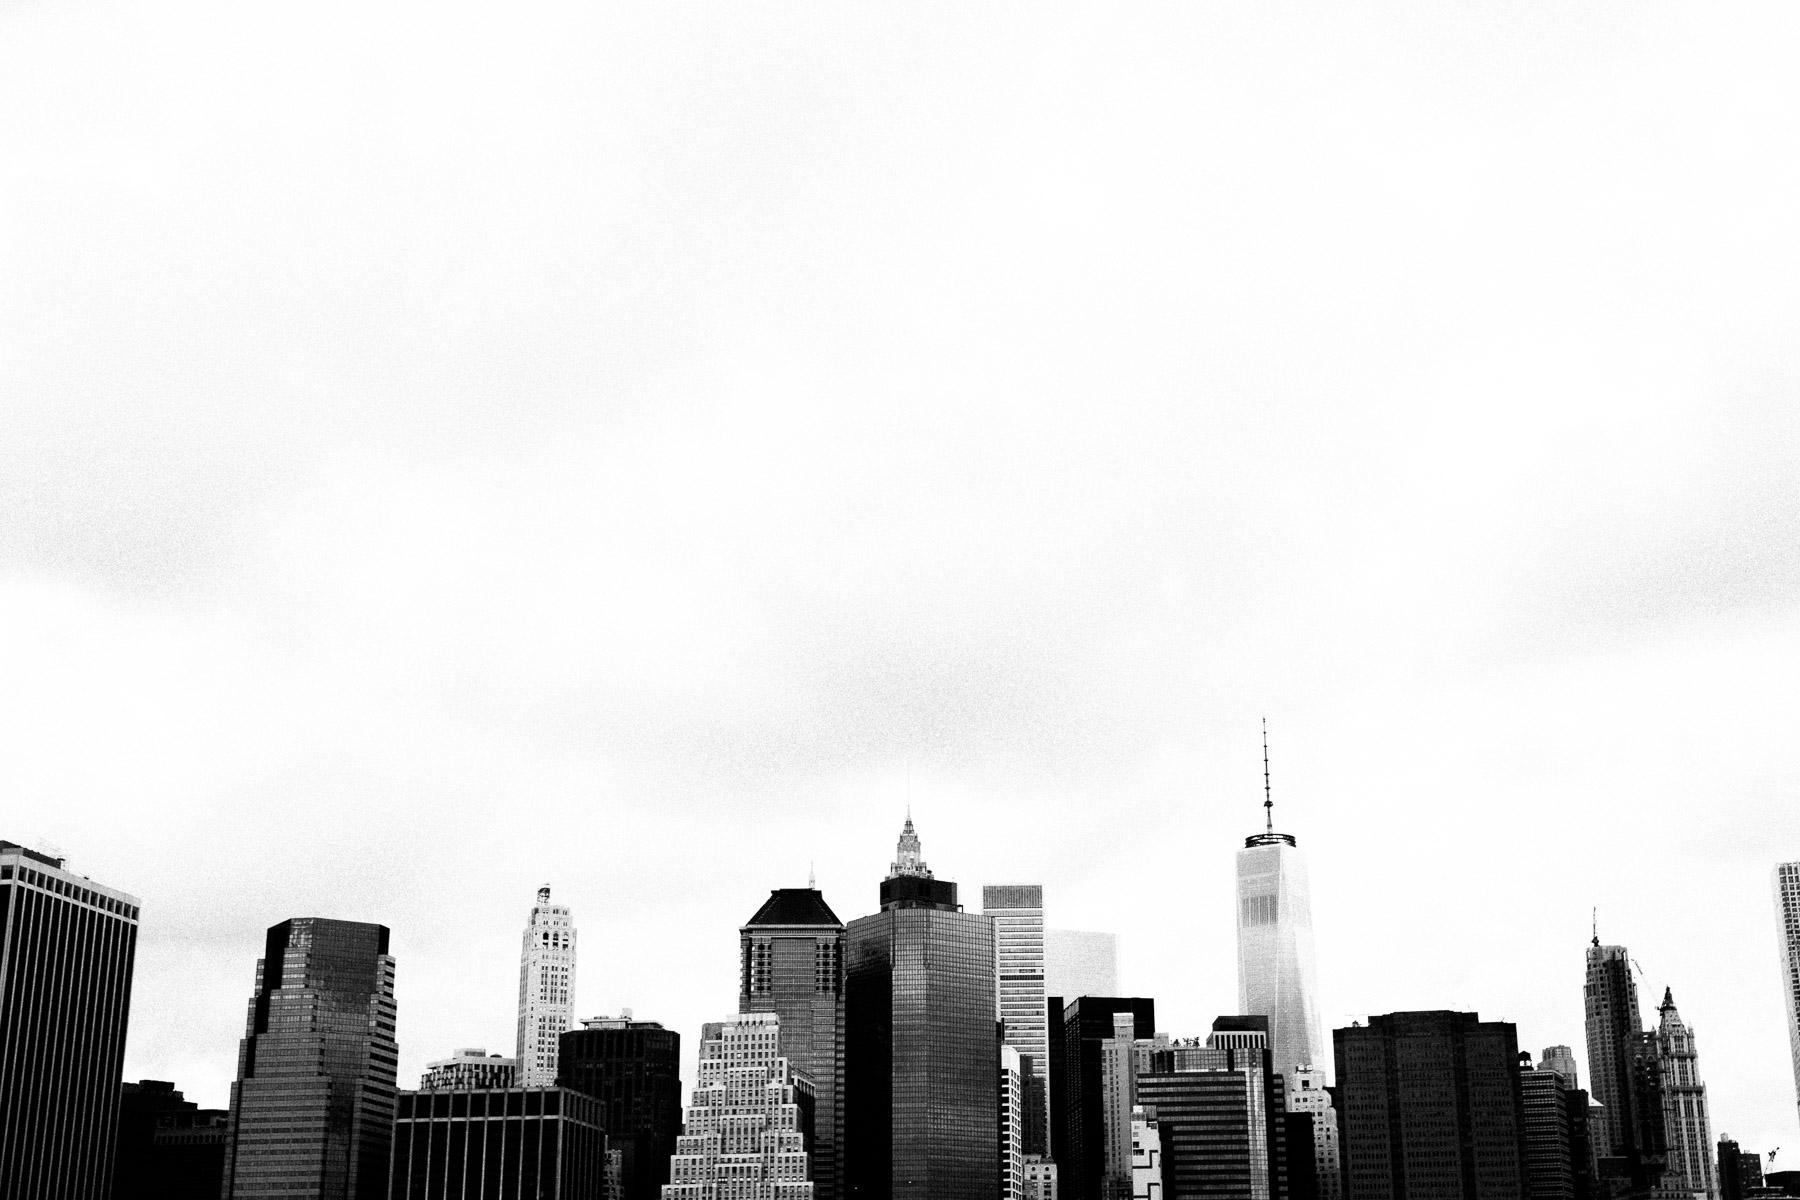 new-york-skyline-photo-black-and-white.jpg